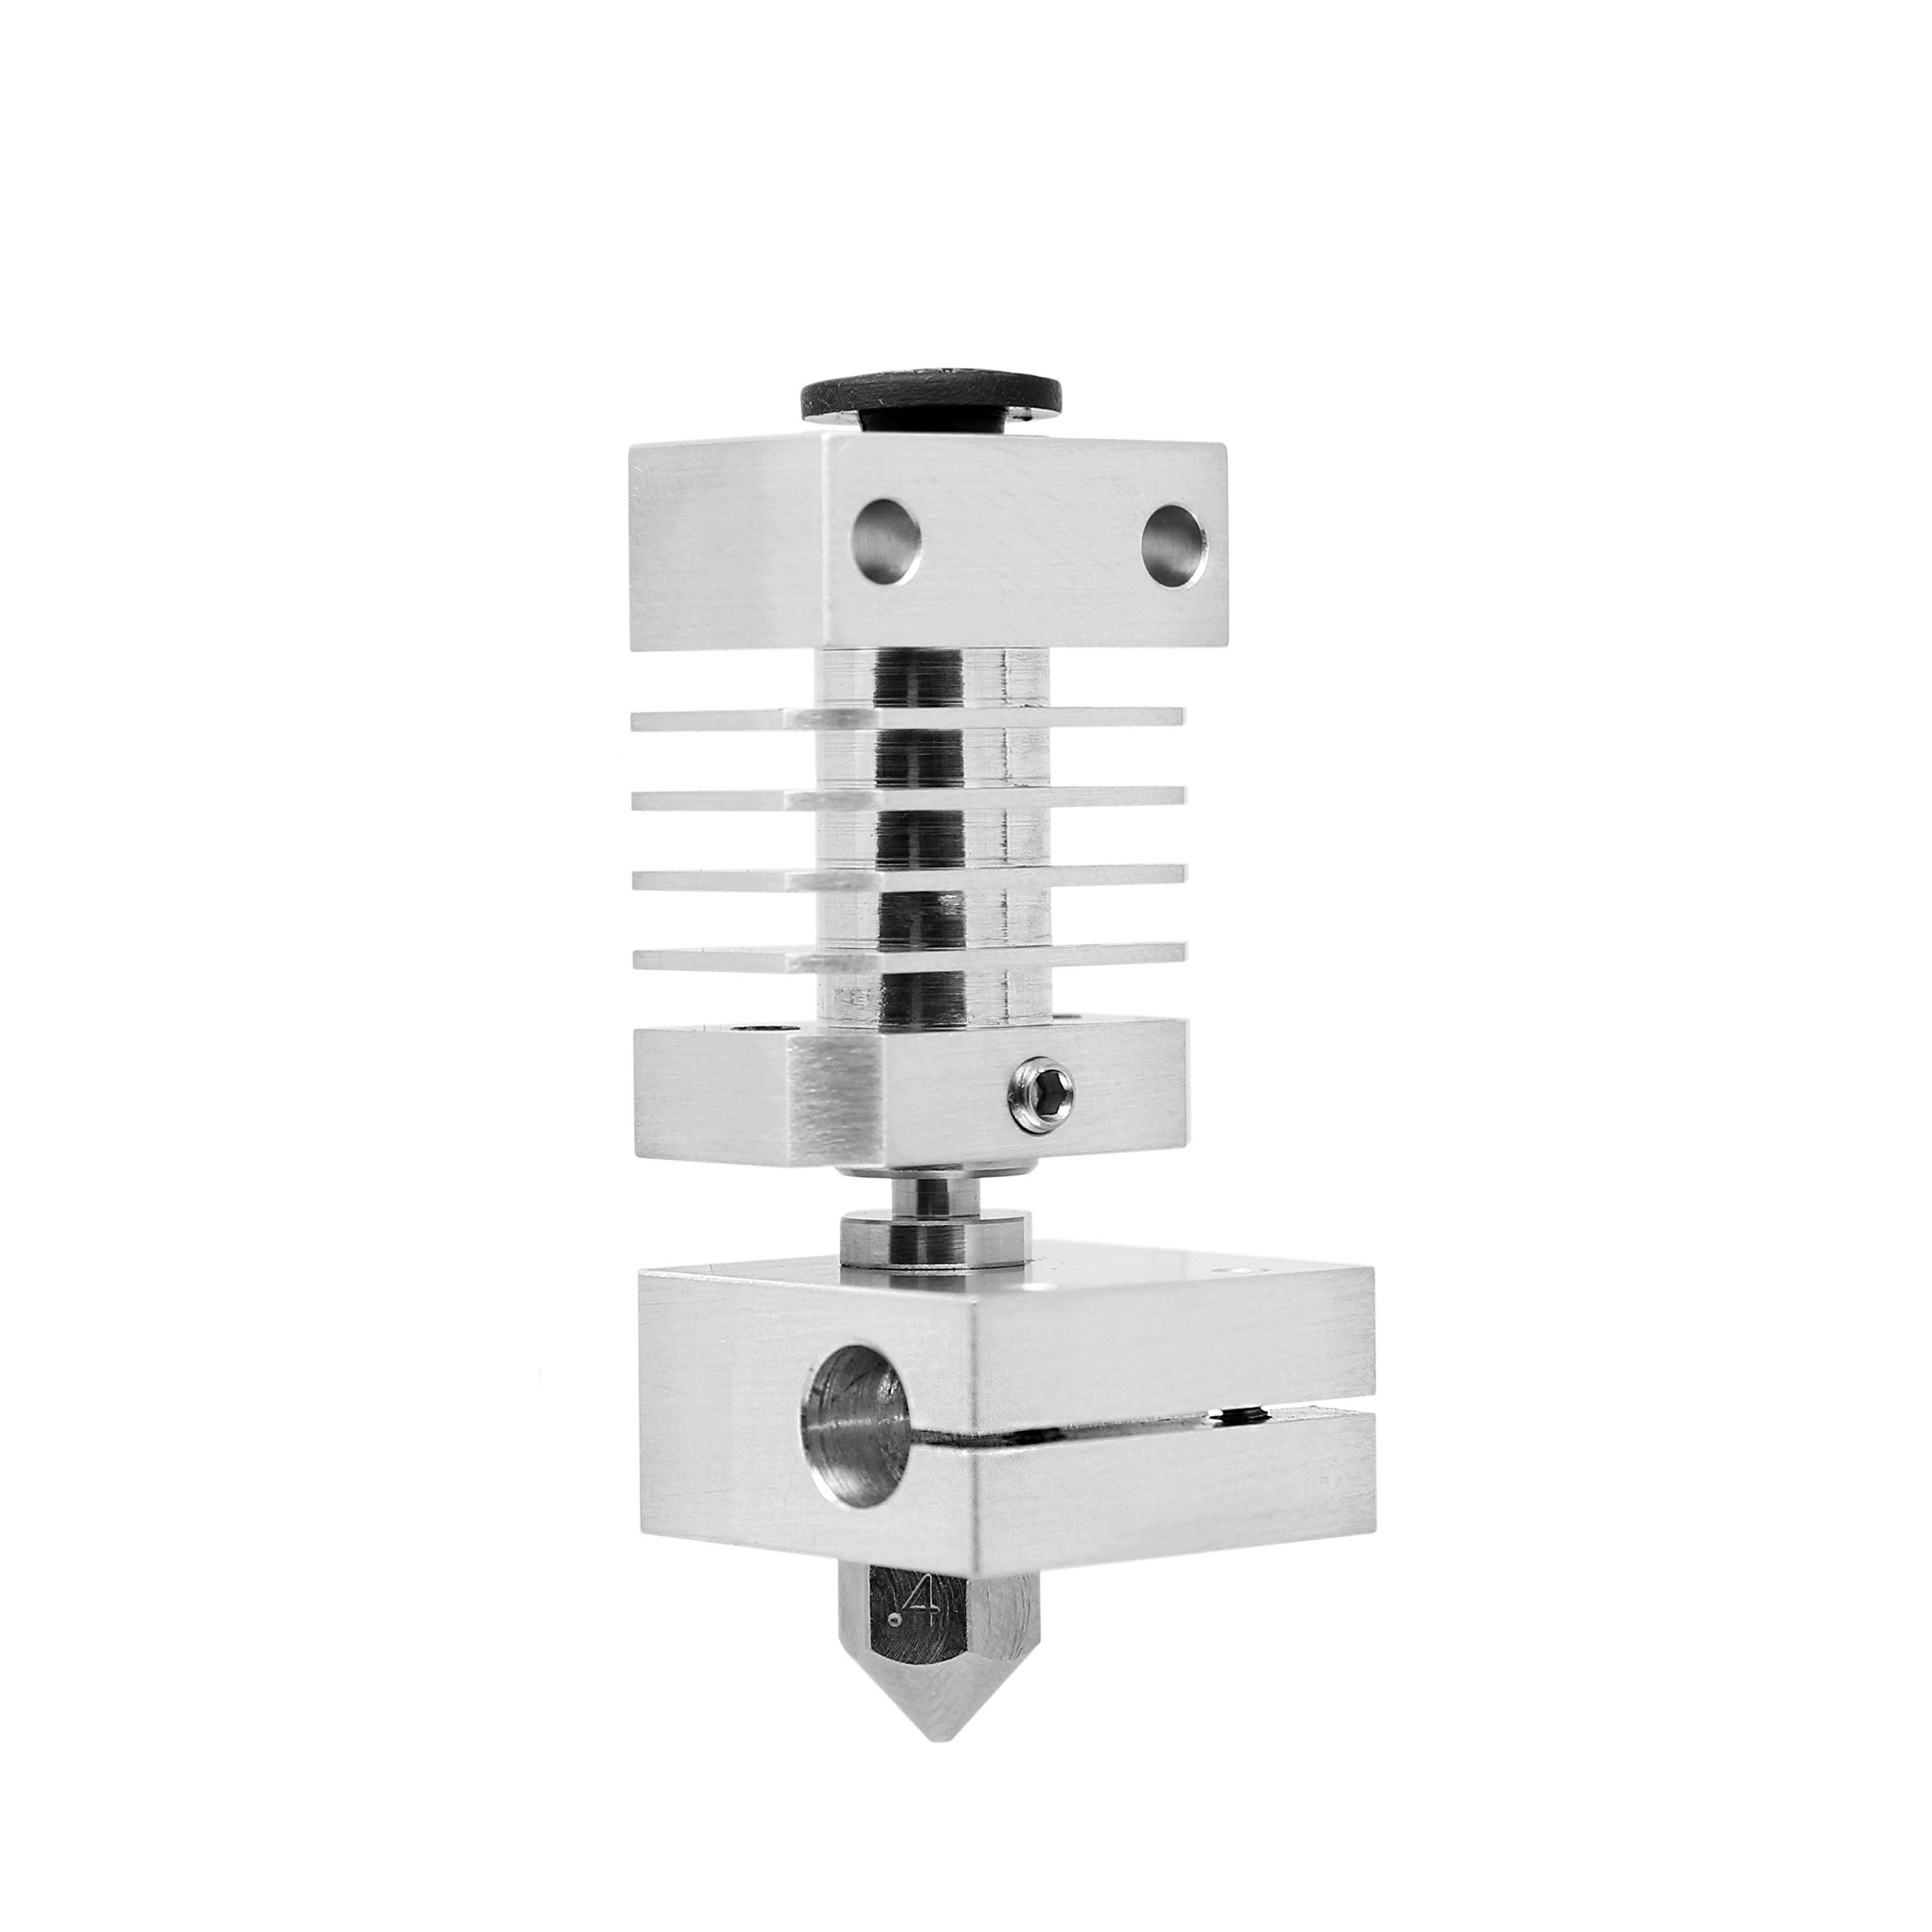 Micro Swiss All Metal Hotend Kit for Creality CR-10 Printers .4mm CR10, CR10S, Ender 2, TronXY X5S